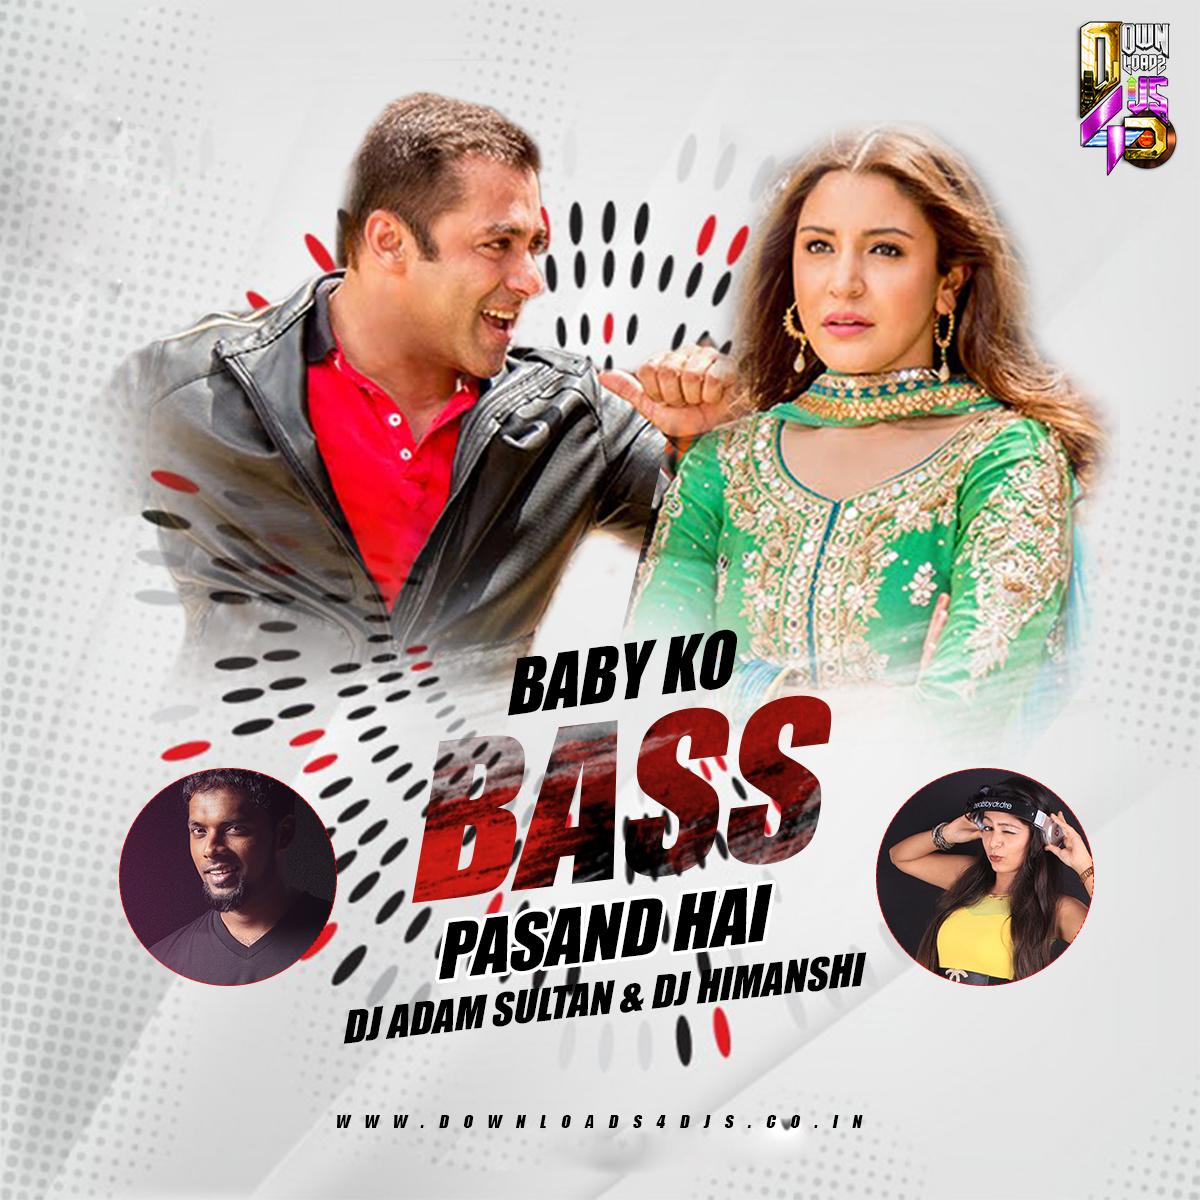 Daru Badnam Dj Remix Sapna: DJ Adam Sultan & DJ Himanshi Koala